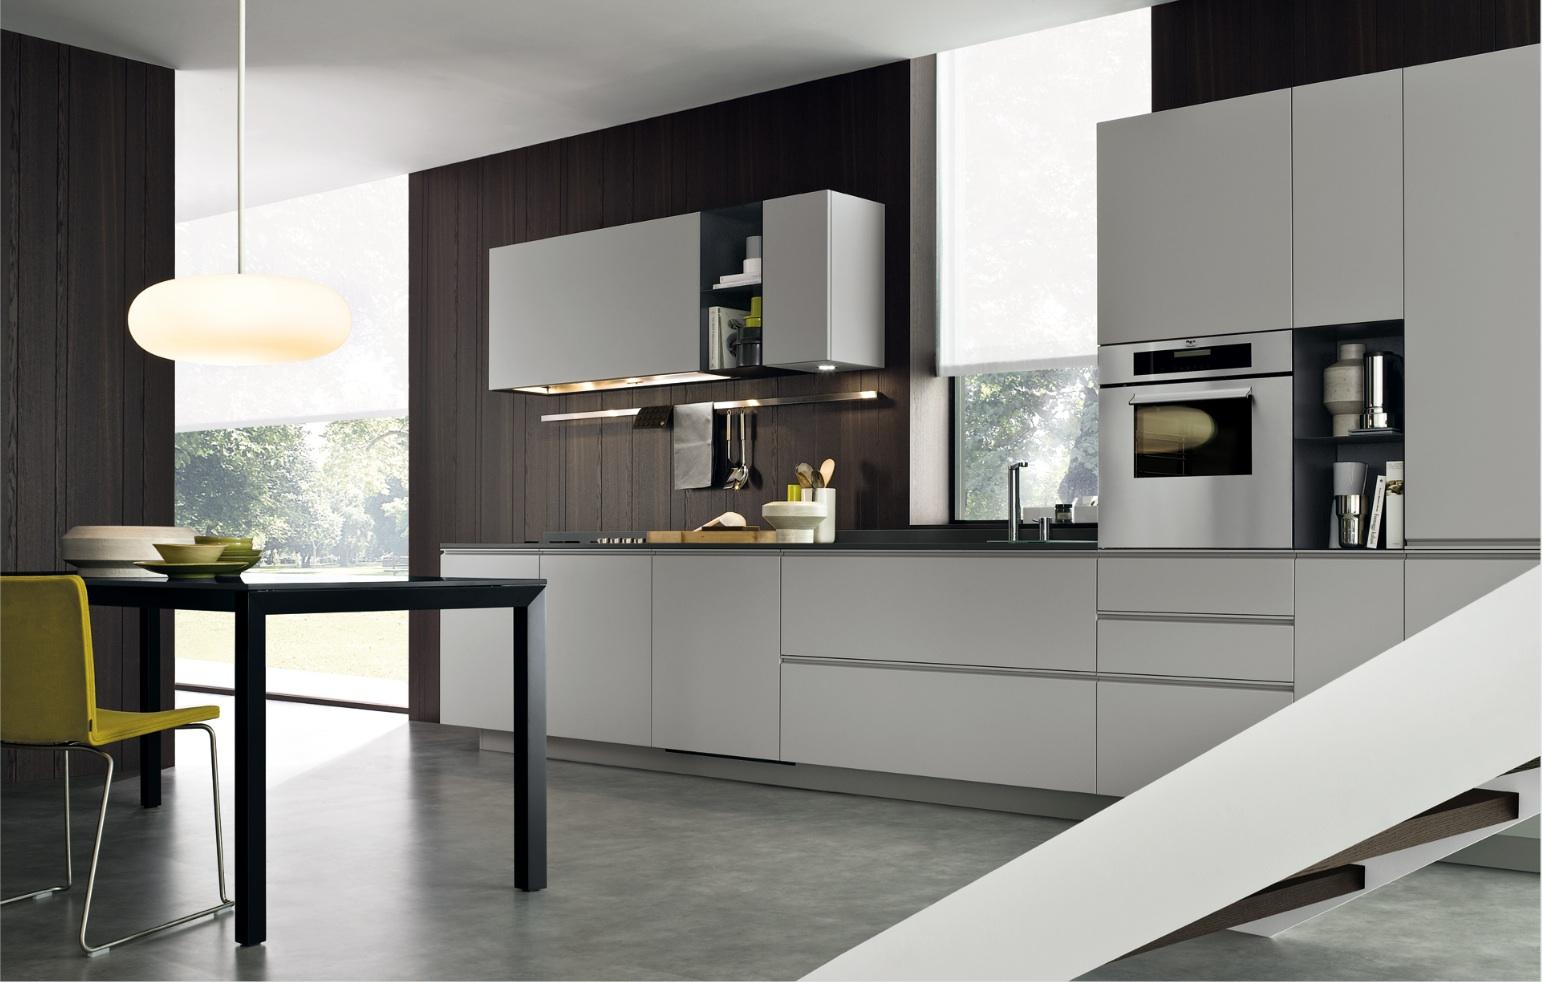 Maison grace varenna my planet kitchens for Varenna kitchen